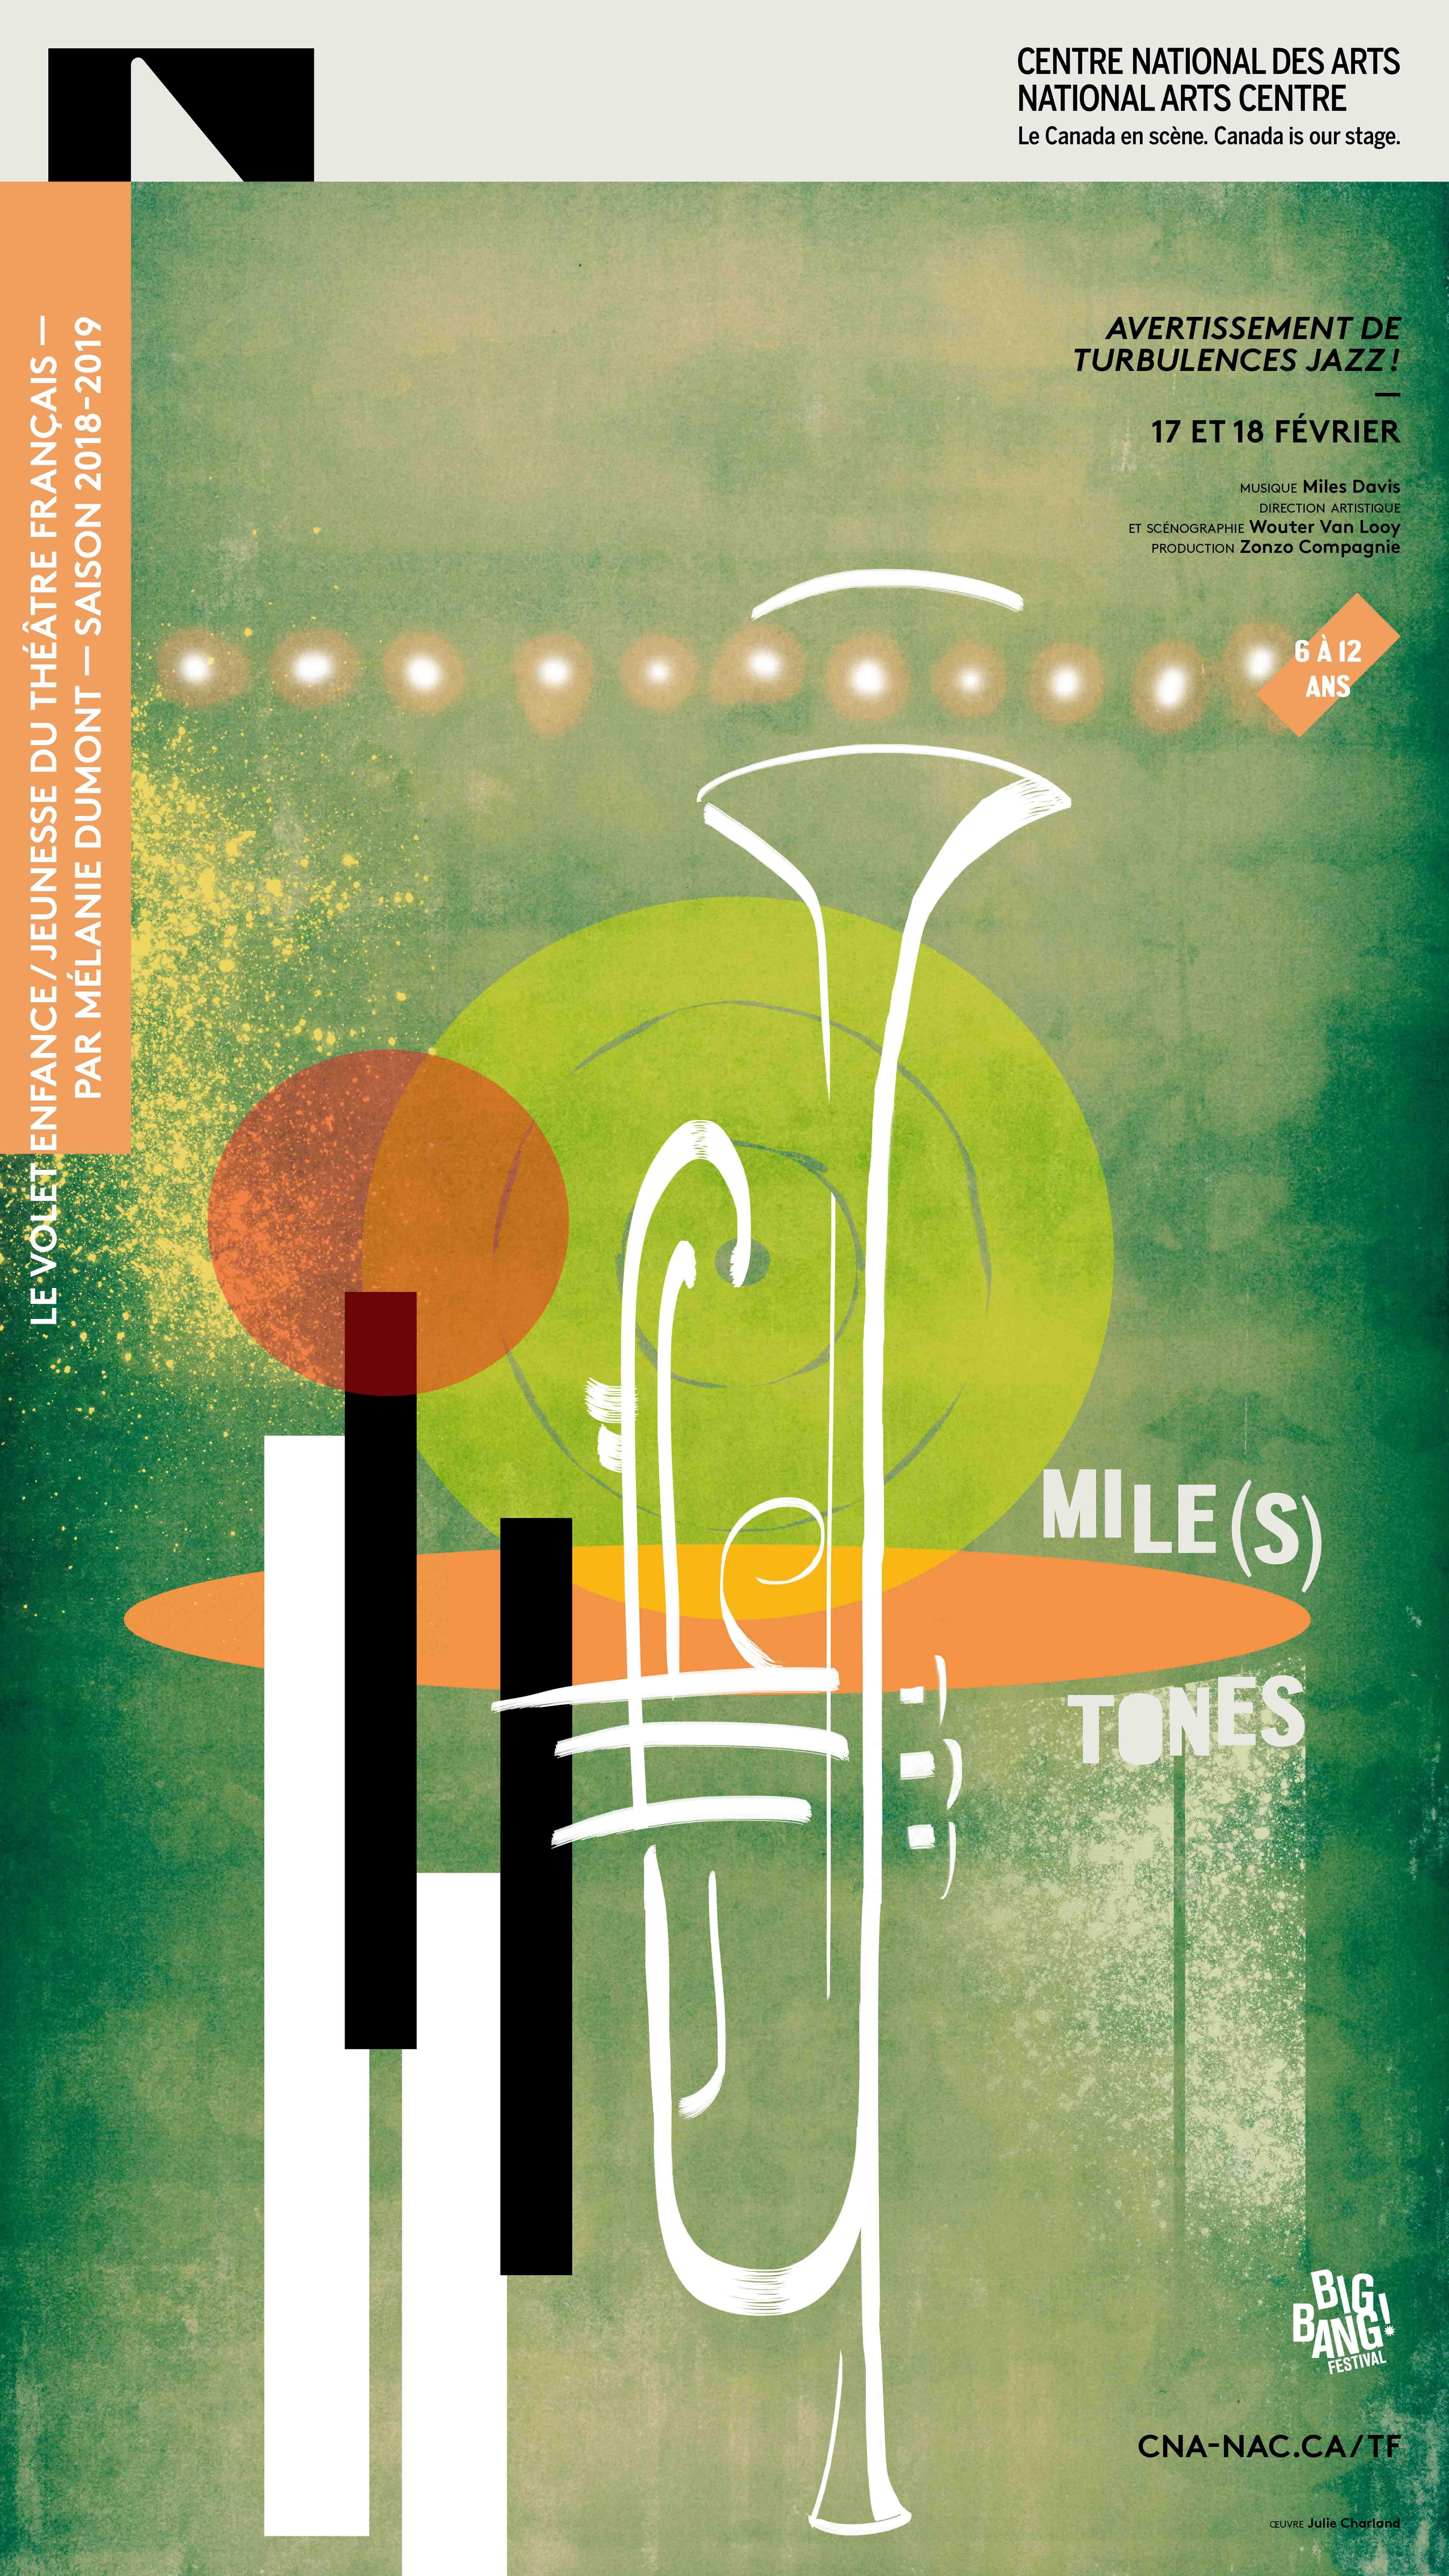 Mile(s)tones / graphisme Gauthier Designers